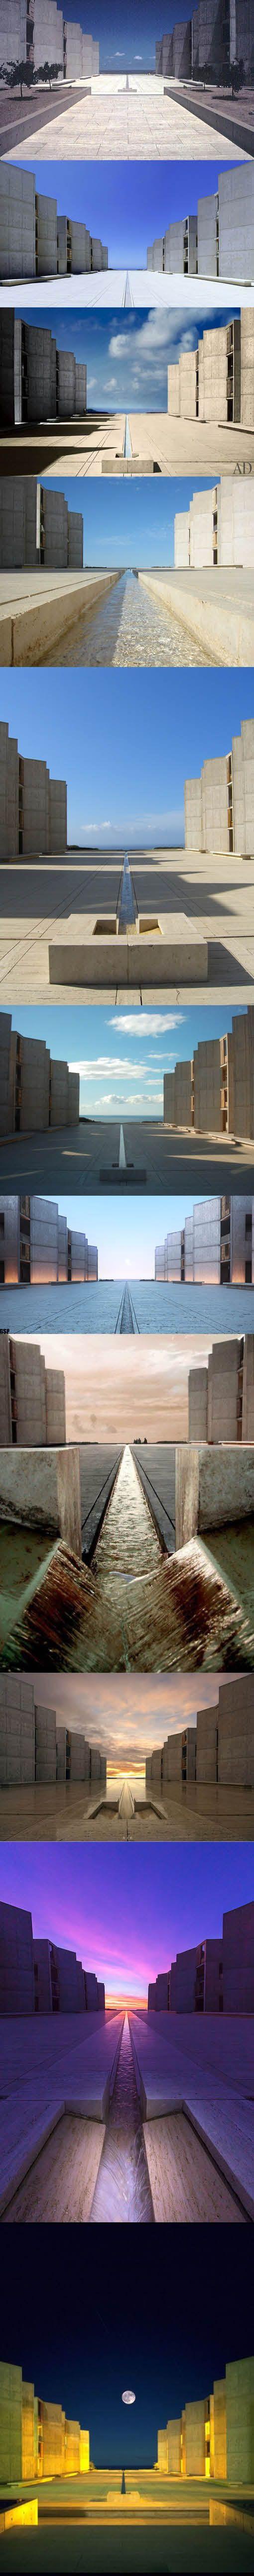 1959-1965 Louis I. Kahn - Salk Institute for Biological Studies / La Jolla California USA / concrete